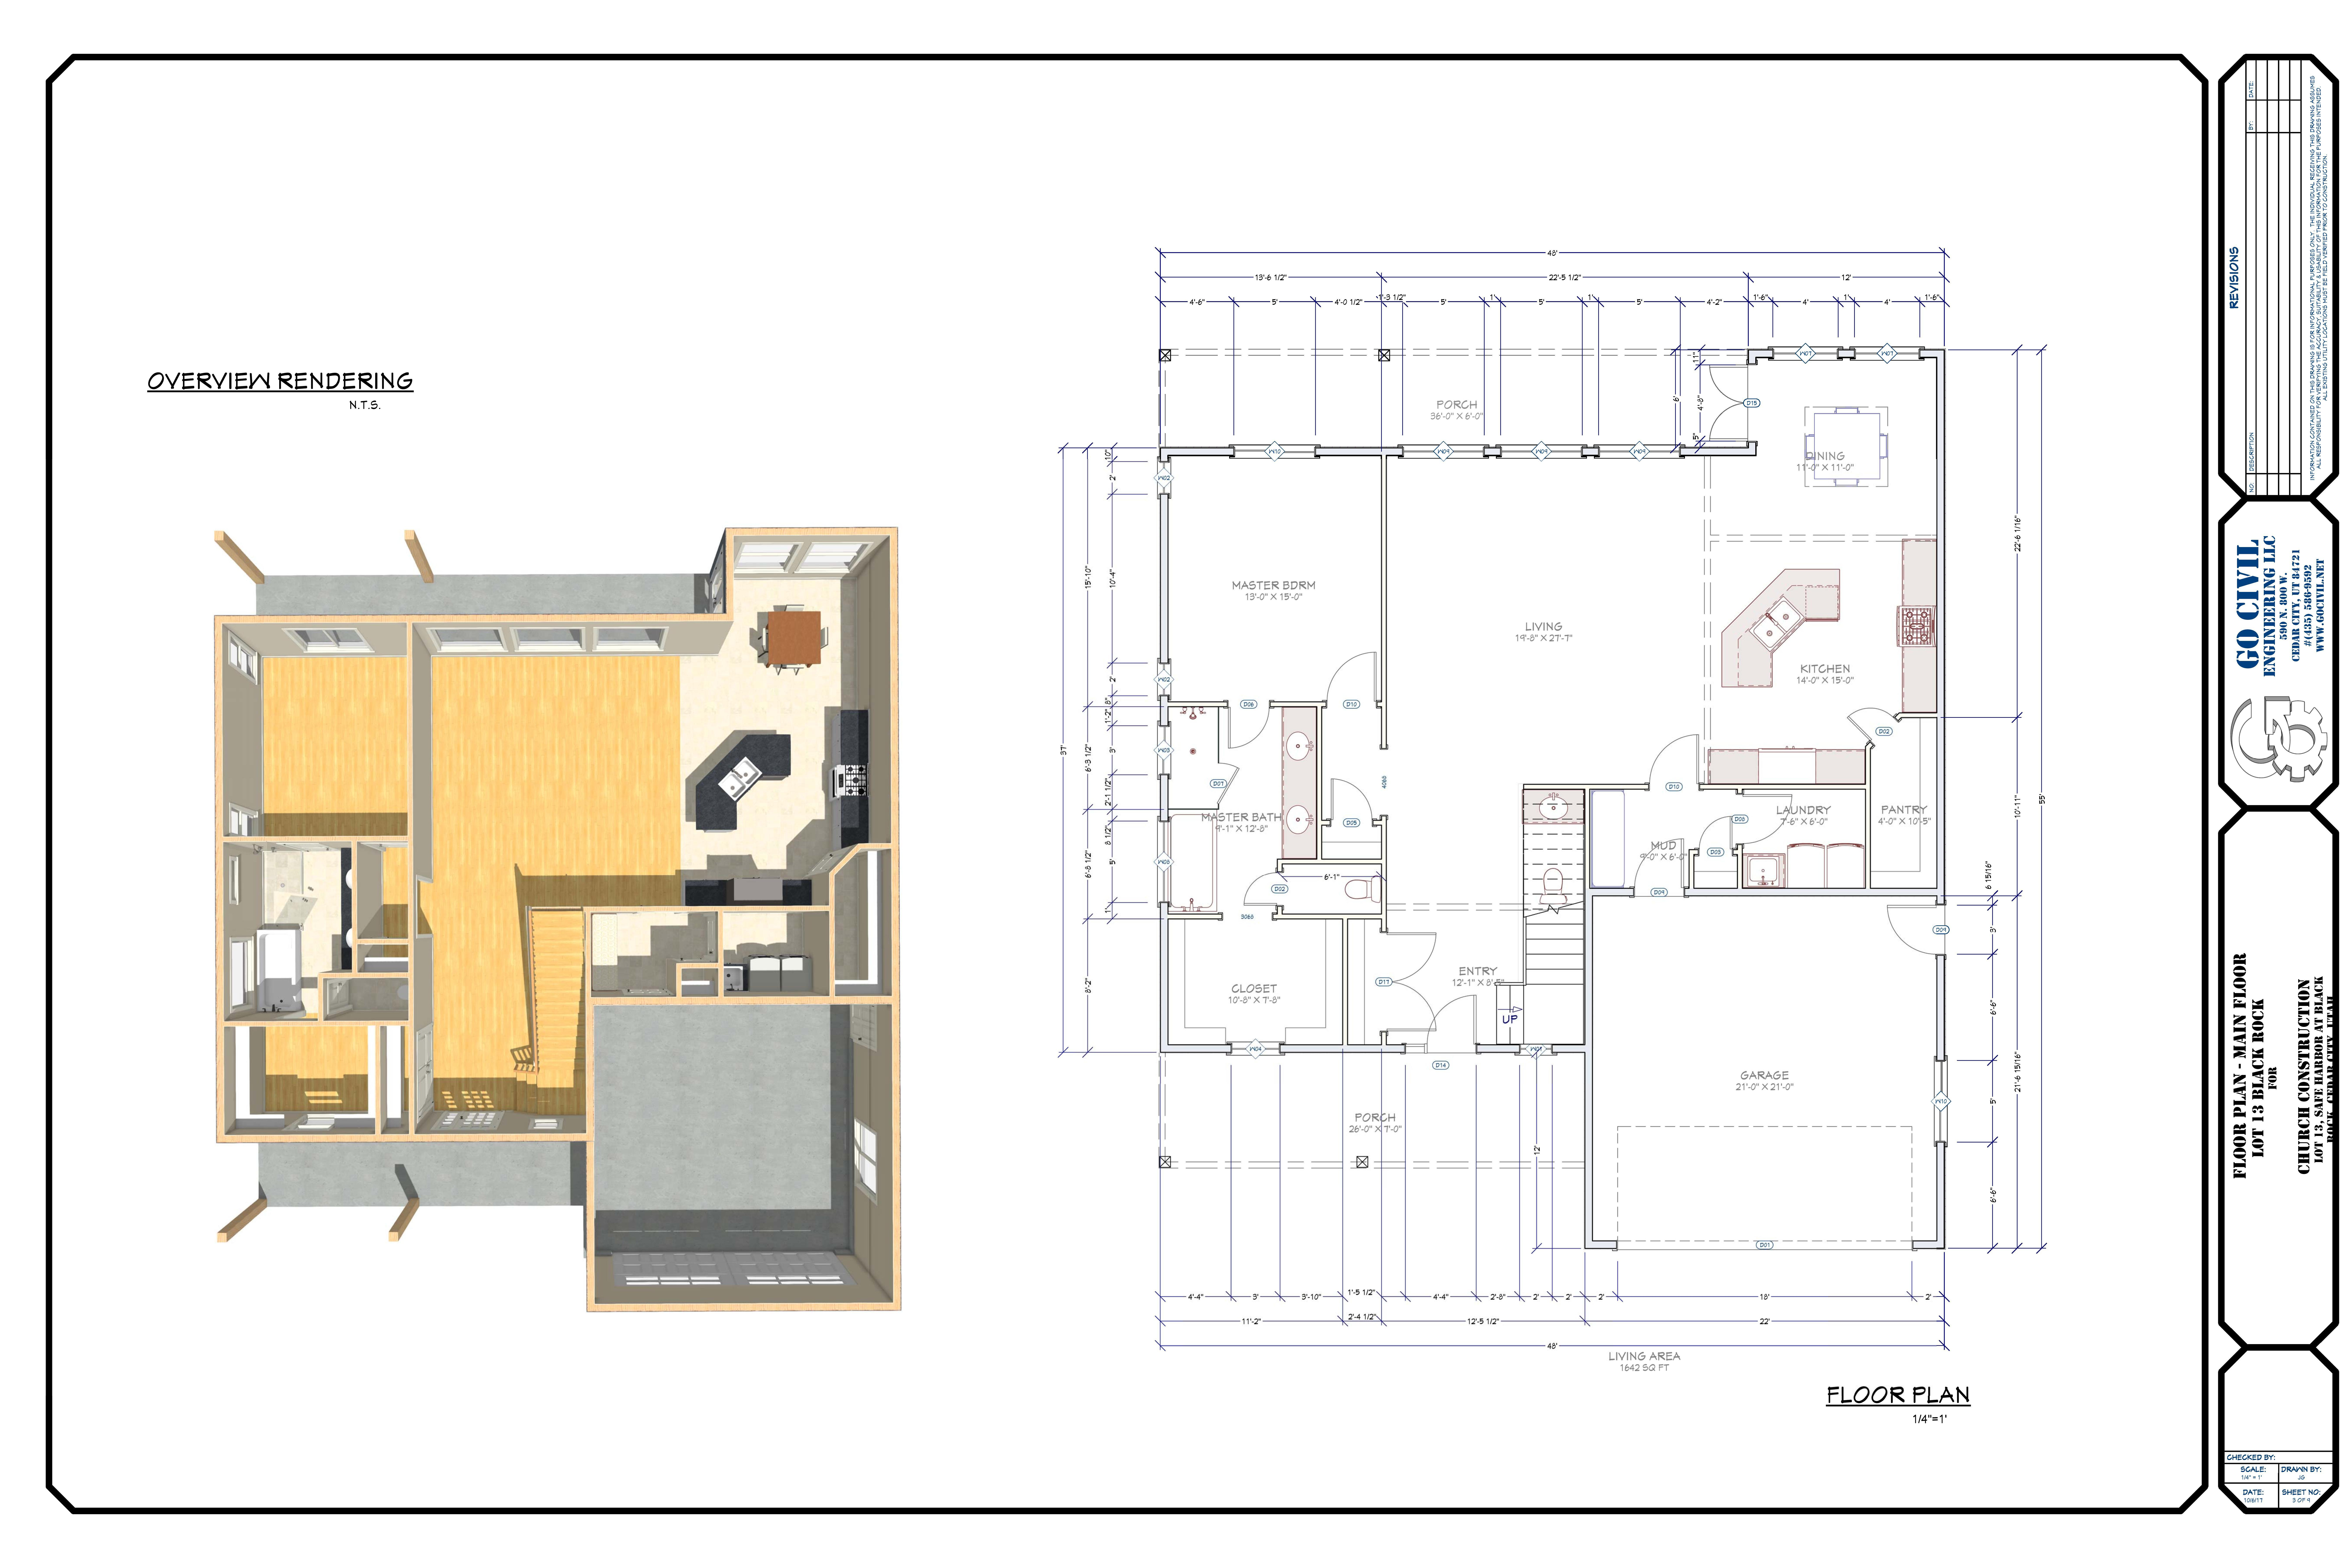 Lot 13 (10-6-17)-page-002.jpg